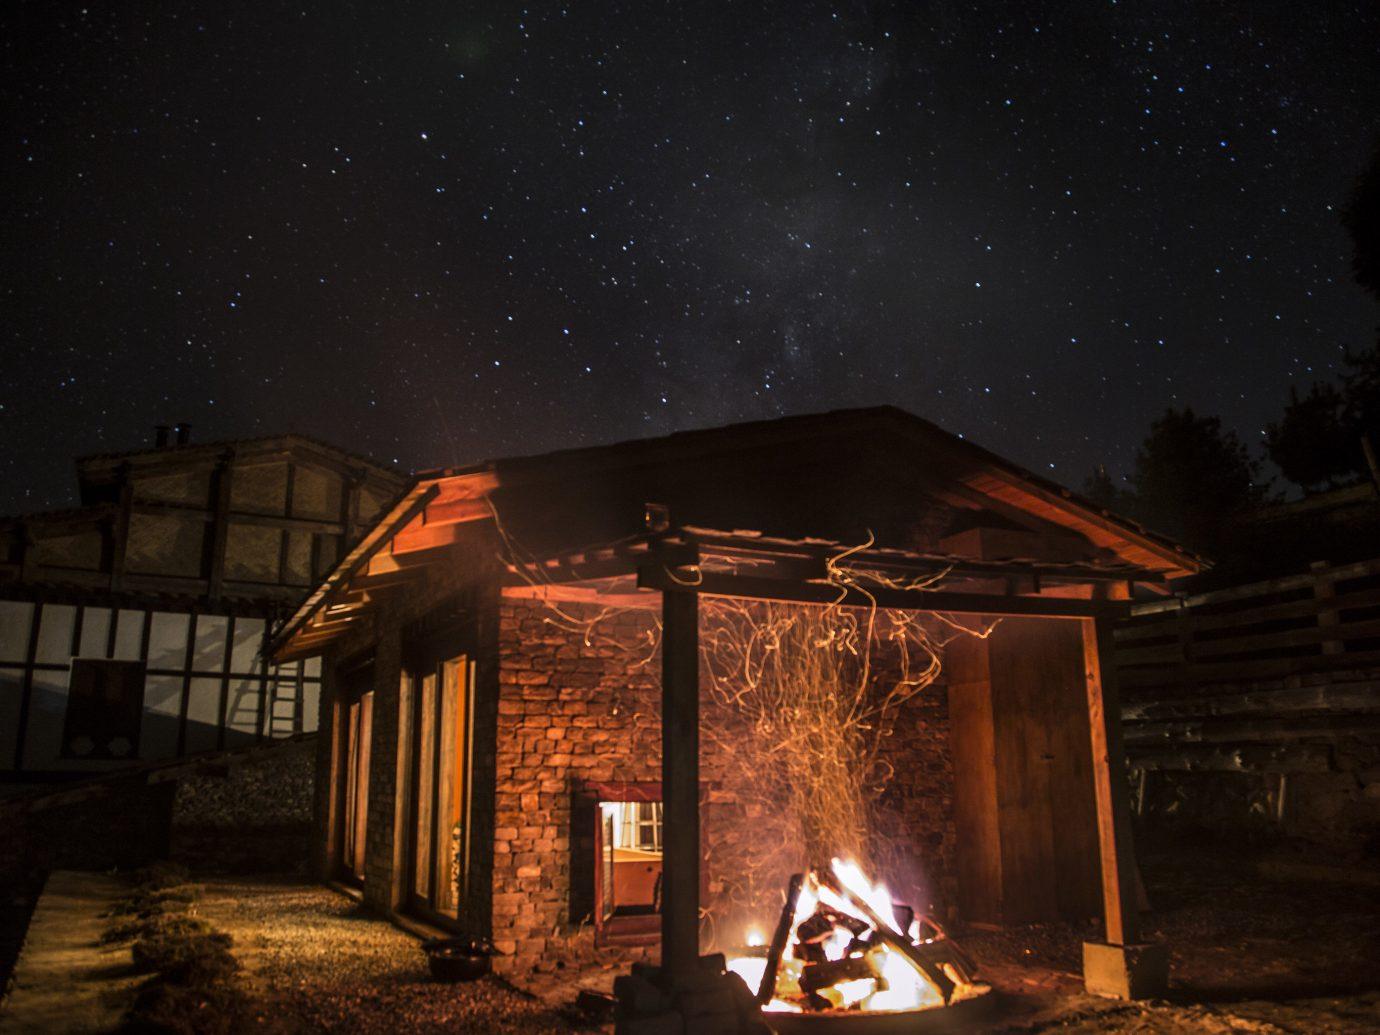 Hotels Offbeat outdoor night sky darkness building atmosphere phenomenon heat lighting fire midnight evening flame dark Fireplace